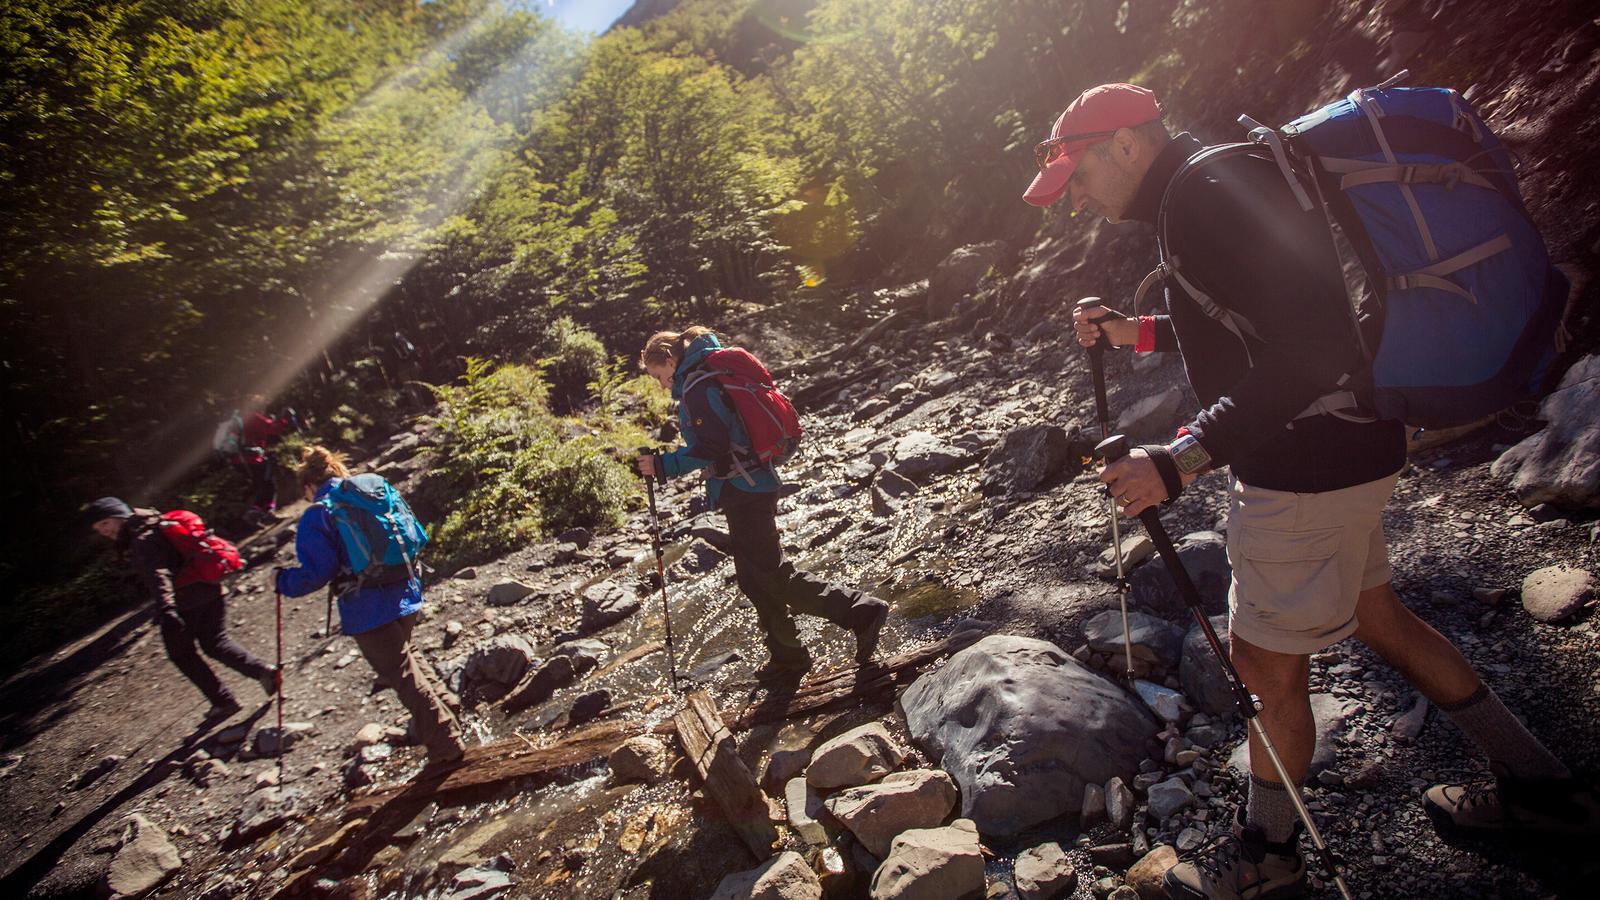 Chile Aktivreise Aconcagua Trek & Mendoza Trek in der Gruppe traveljunkies